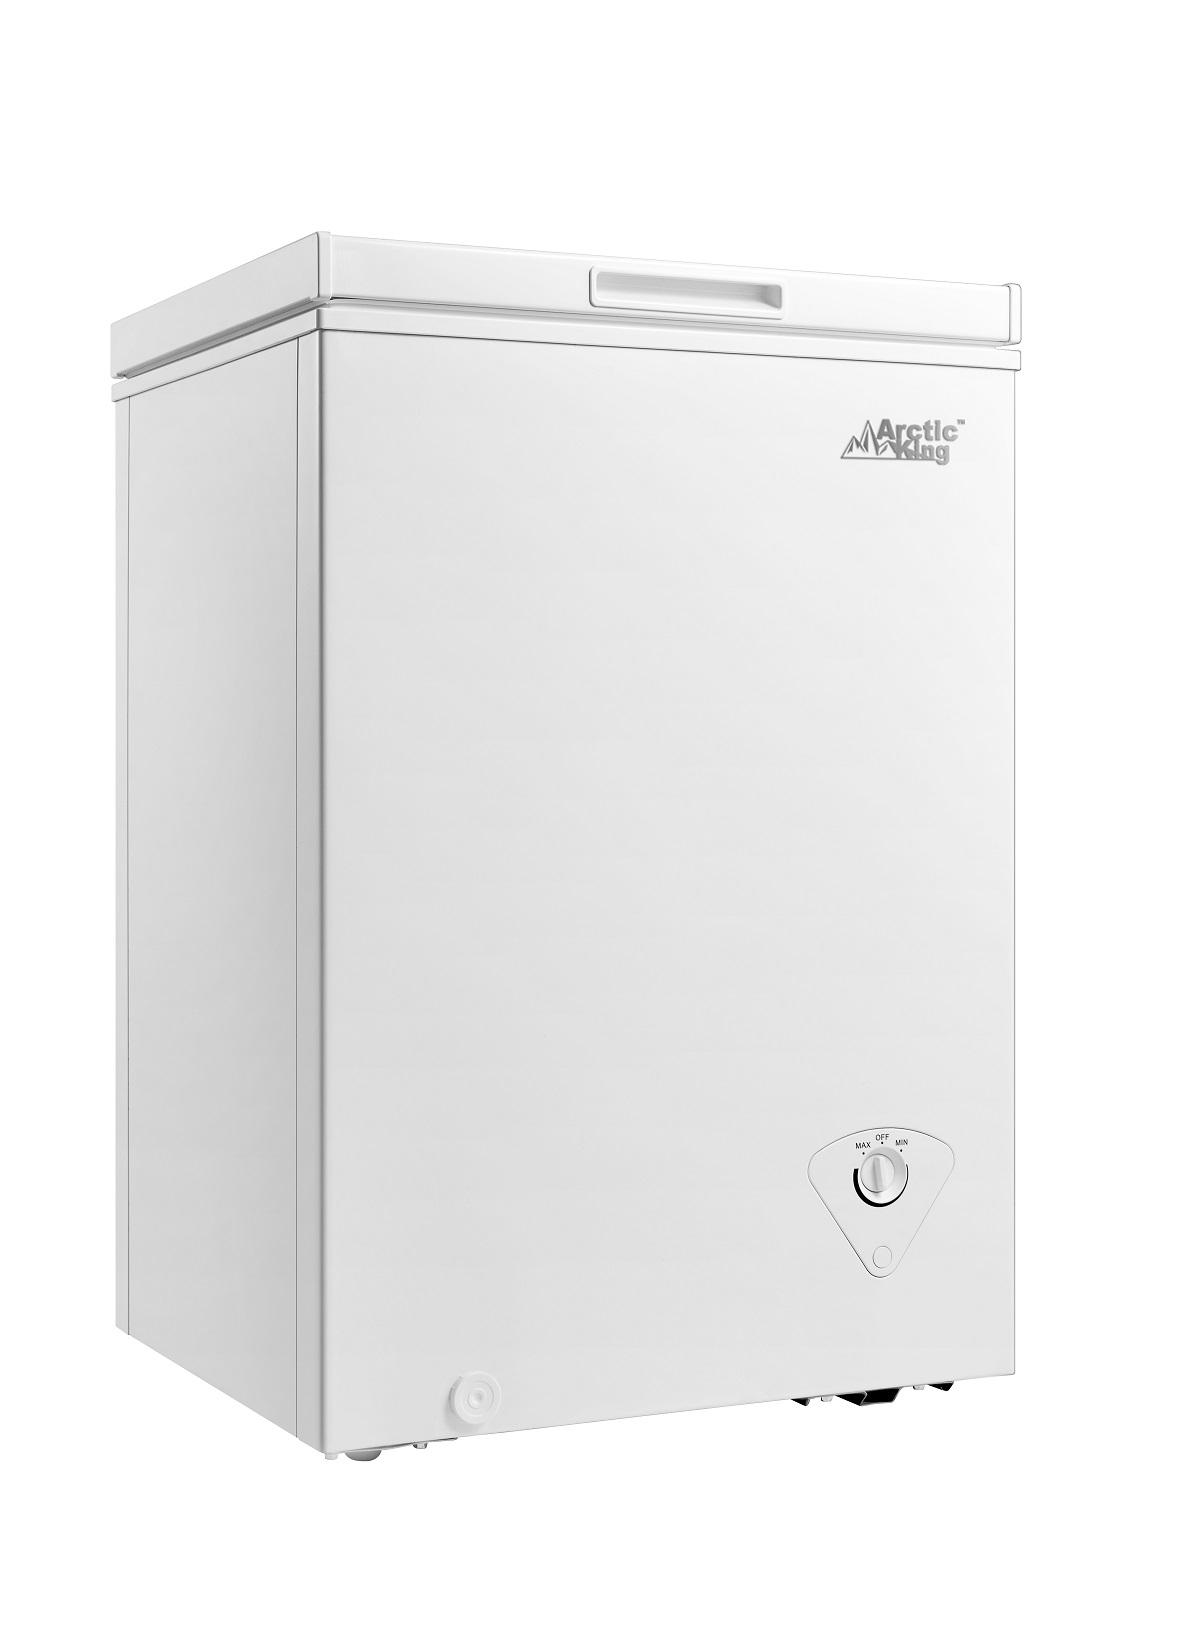 Arctic King 3.5 Cu Ft Chest Freezer